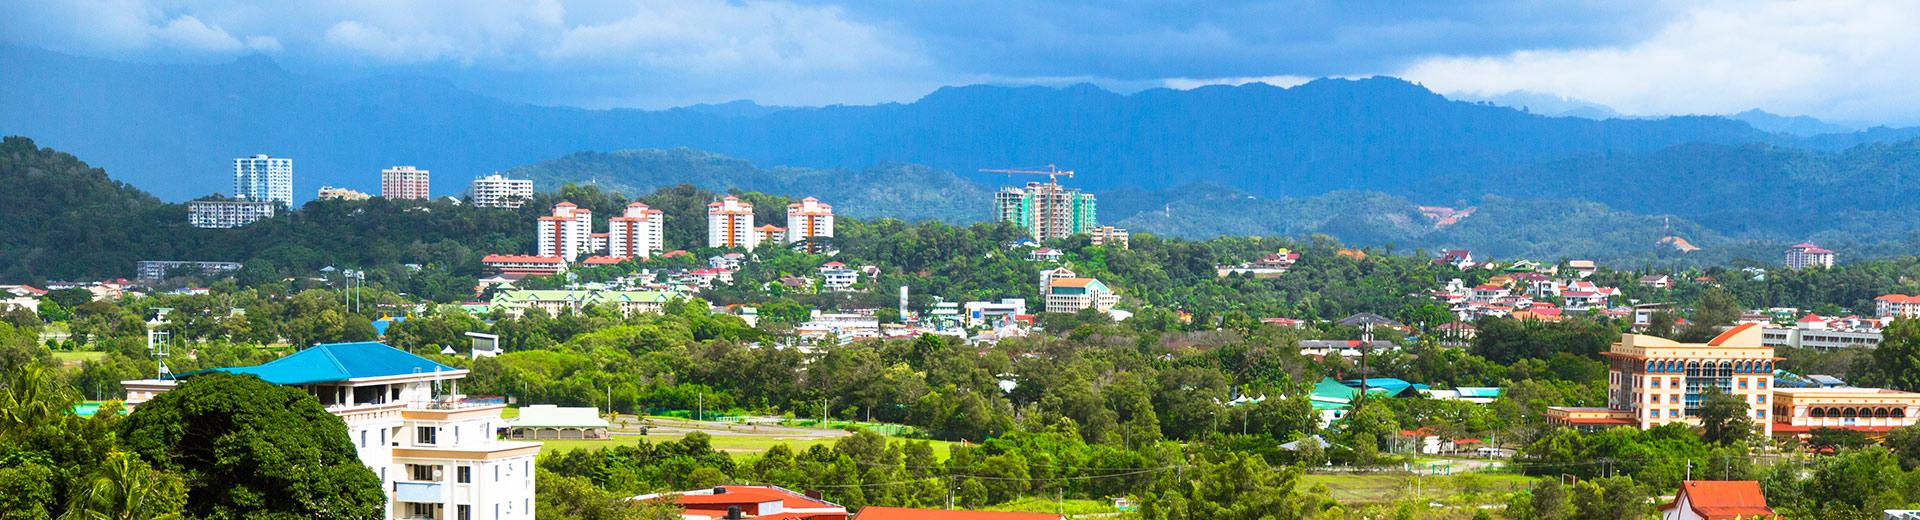 Book your Kota Kinabalu taxi alternative online | Blacklane